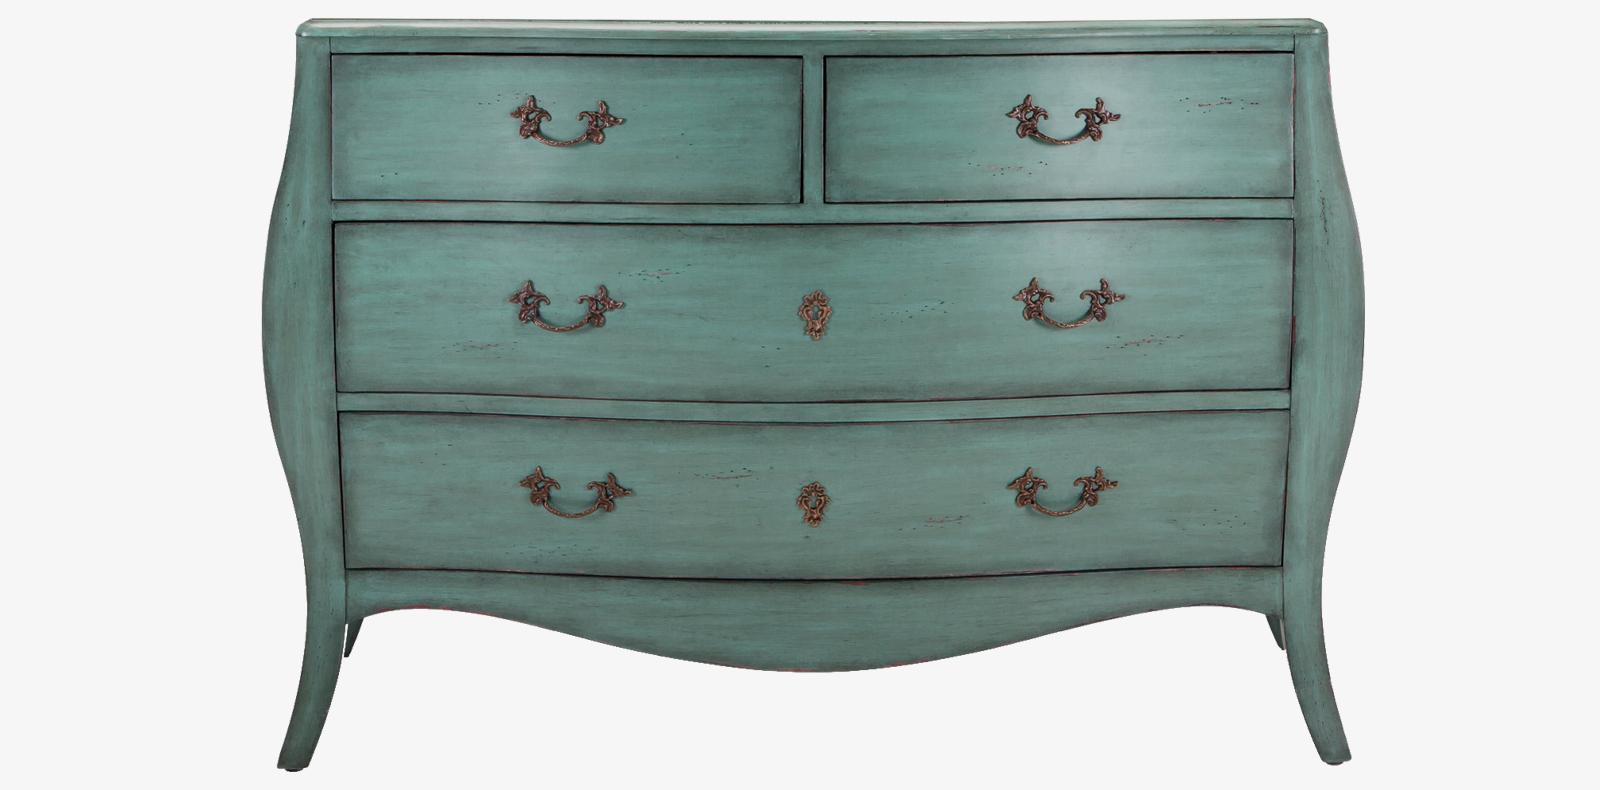 shabby-chic-furniture-houston-shabby-chic-furniture-decor-on-furniture